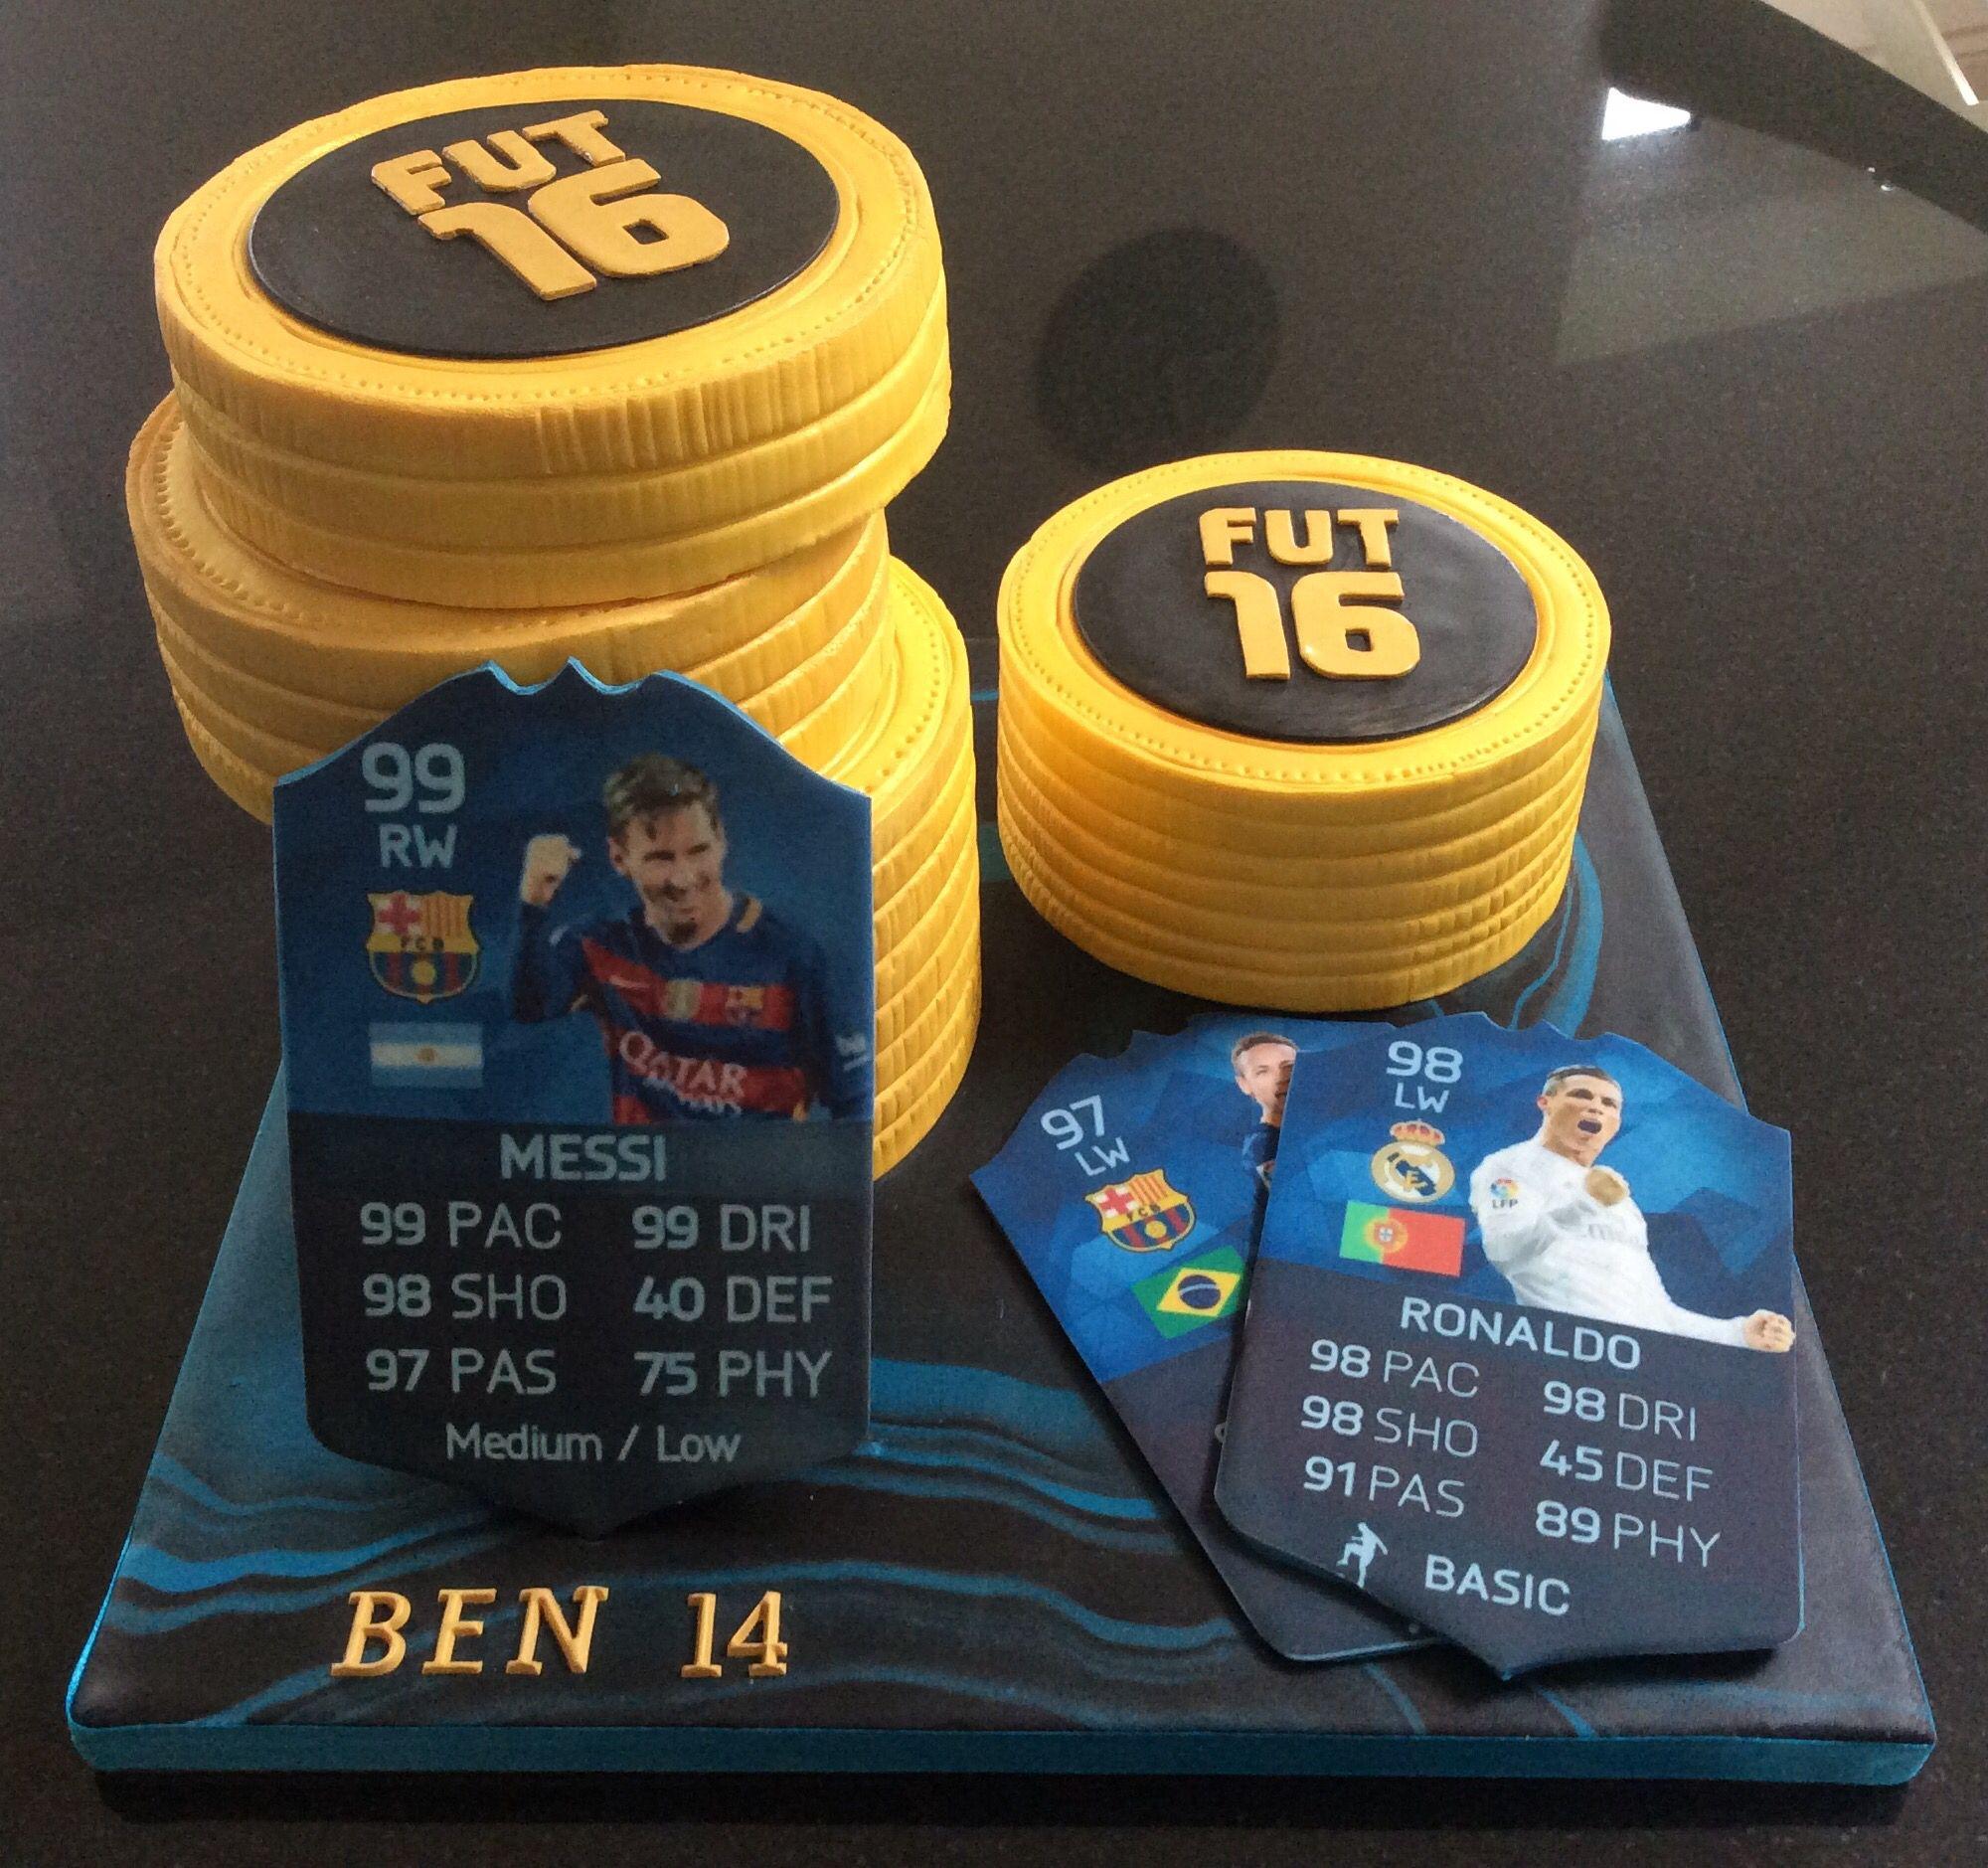 Ben S Fifa 16 Birthday Cake Fifa Cake Cakes For Boys Cupcake Cakes